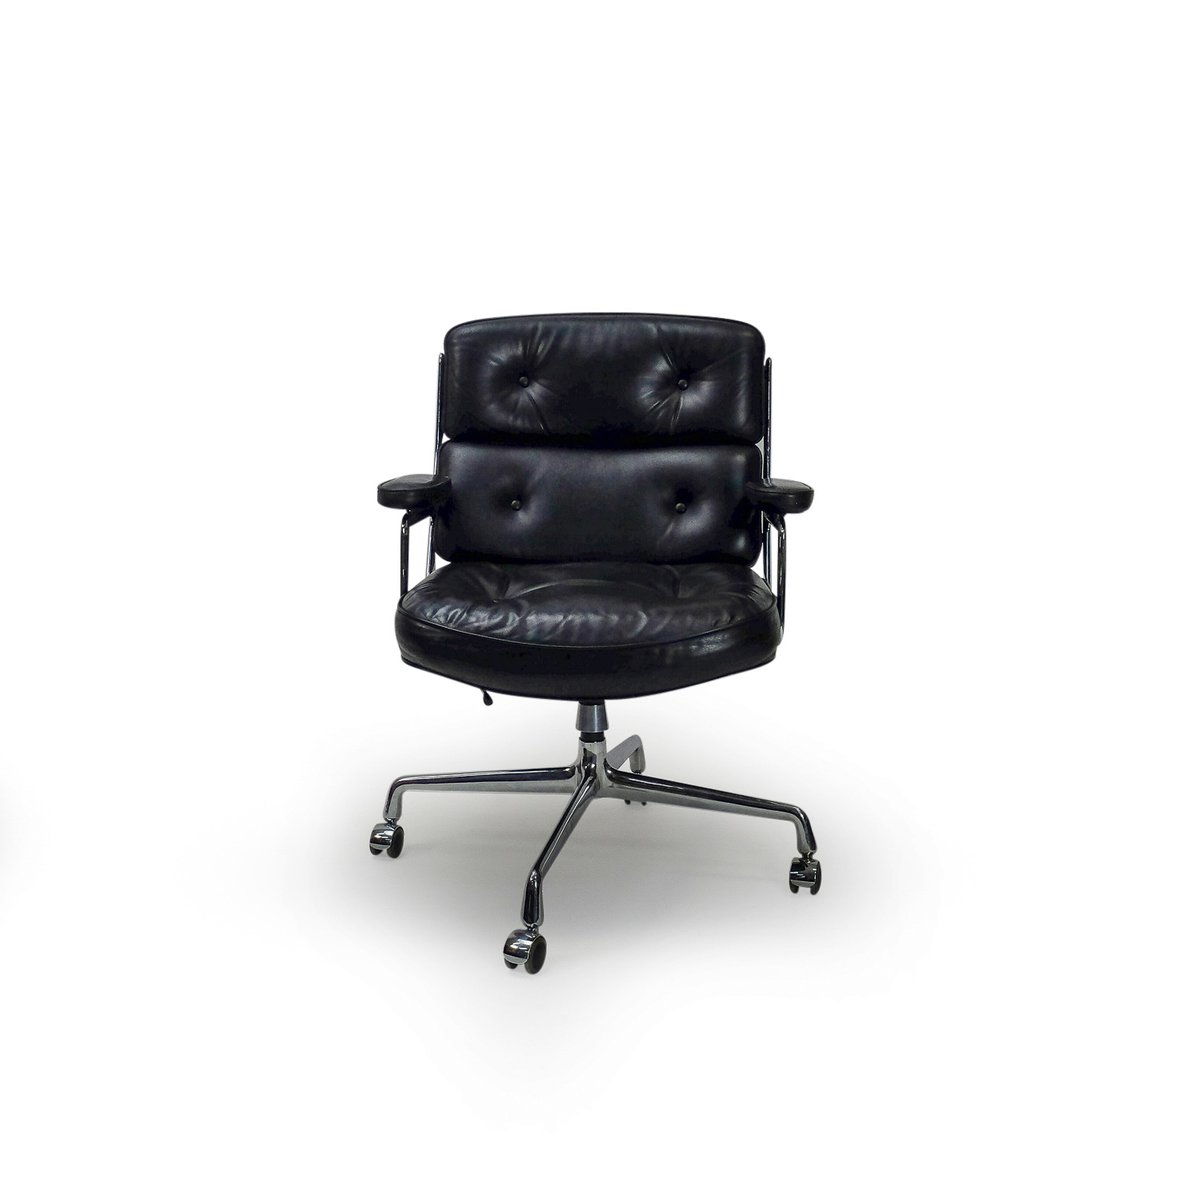 chaise time life lobby es104 vintage par charles ray eames pour vitra en vente sur pamono. Black Bedroom Furniture Sets. Home Design Ideas